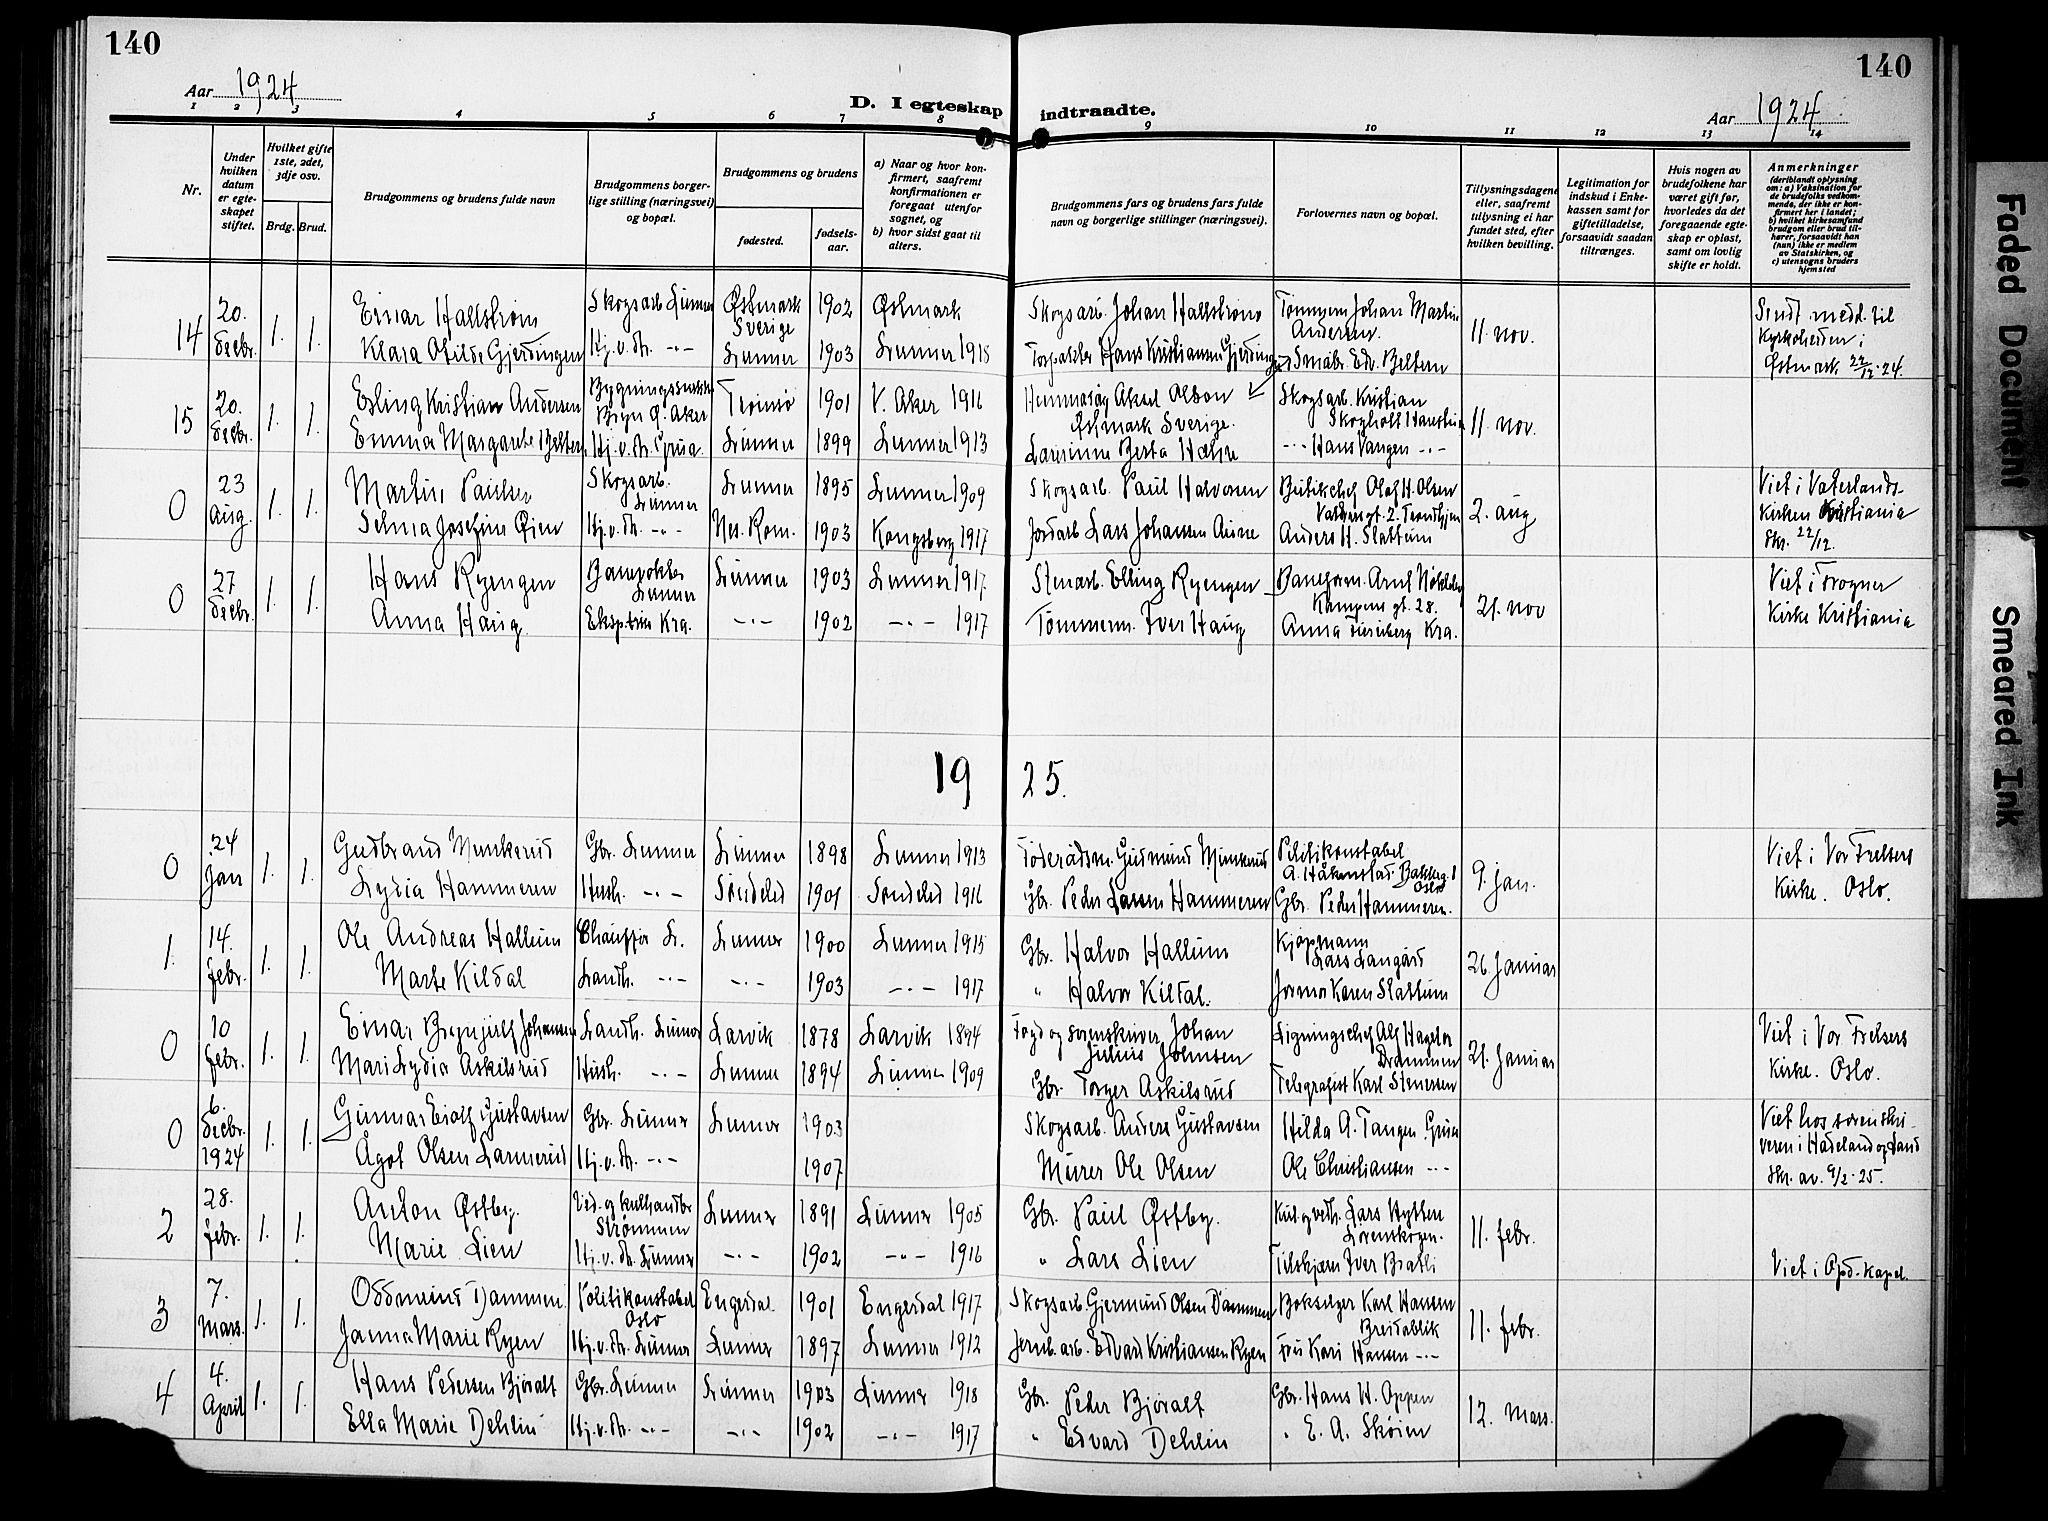 SAH, Lunner prestekontor, H/Ha/Hab/L0002: Klokkerbok nr. 2, 1923-1933, s. 140